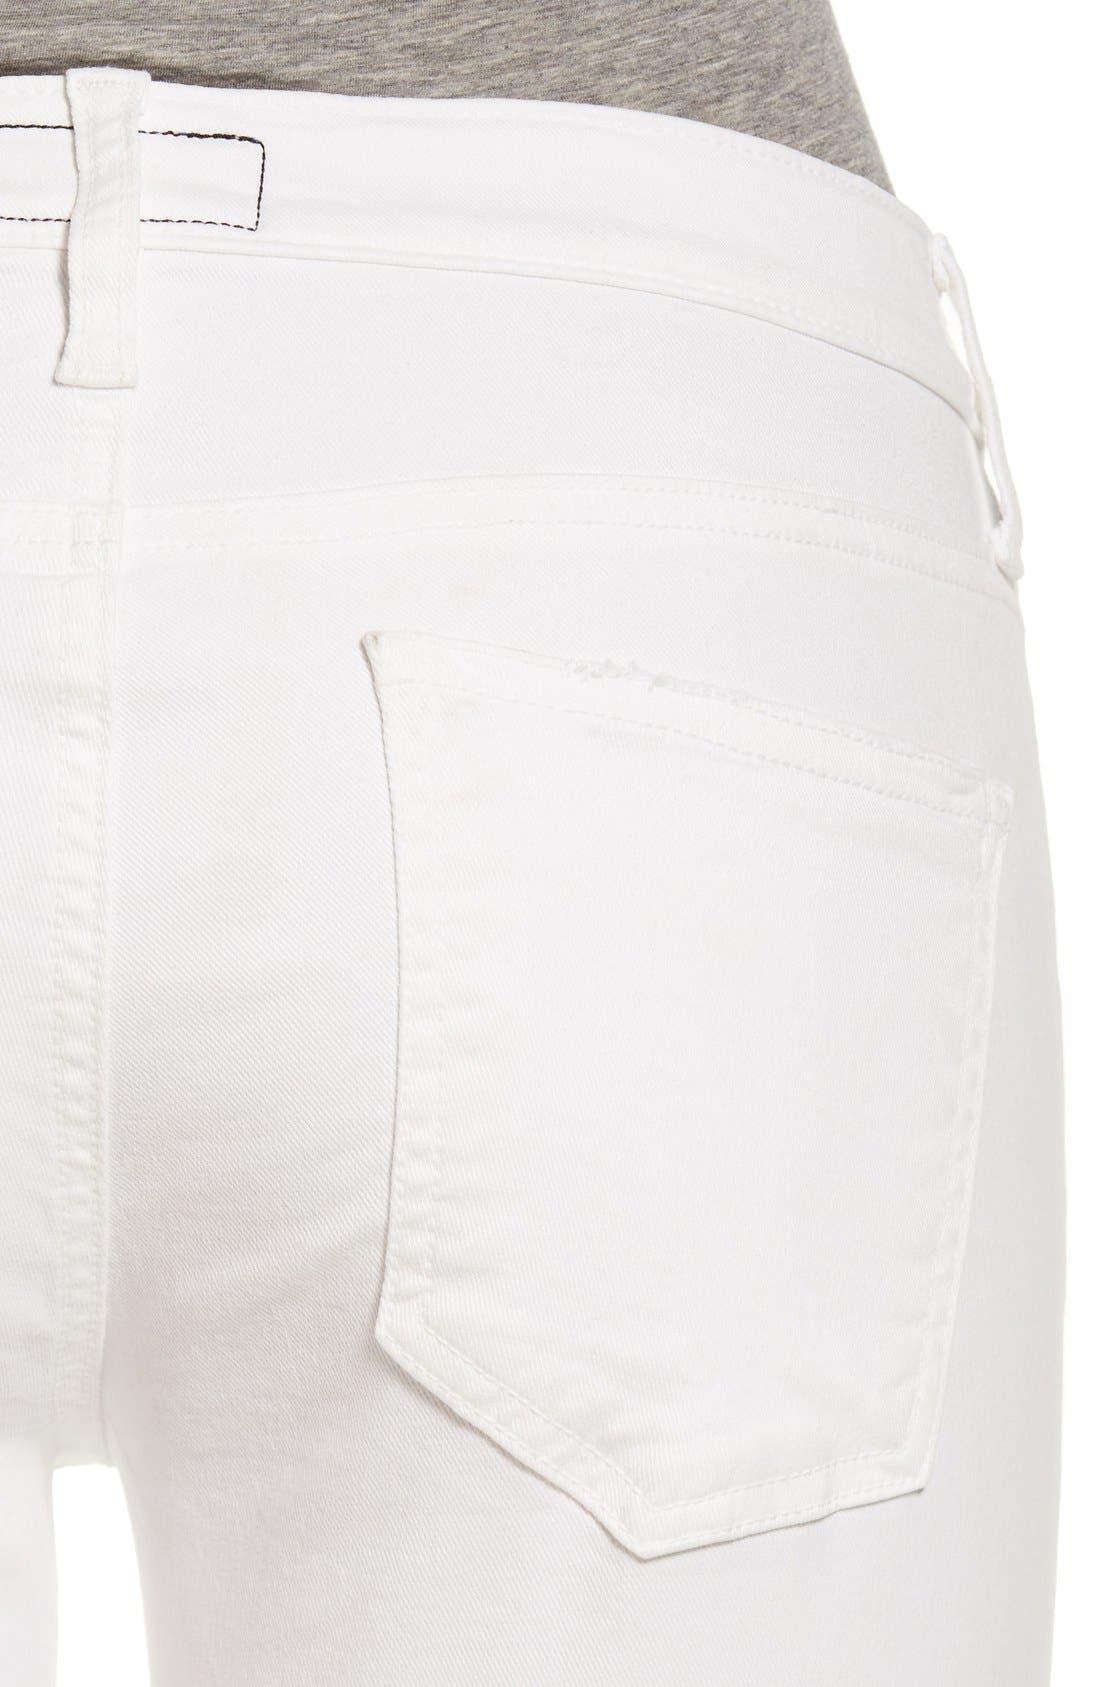 Alternate Image 4  - Current/Elliott 'The Zip Moto' Ankle Skinny Jeans (Dirty White Noise)